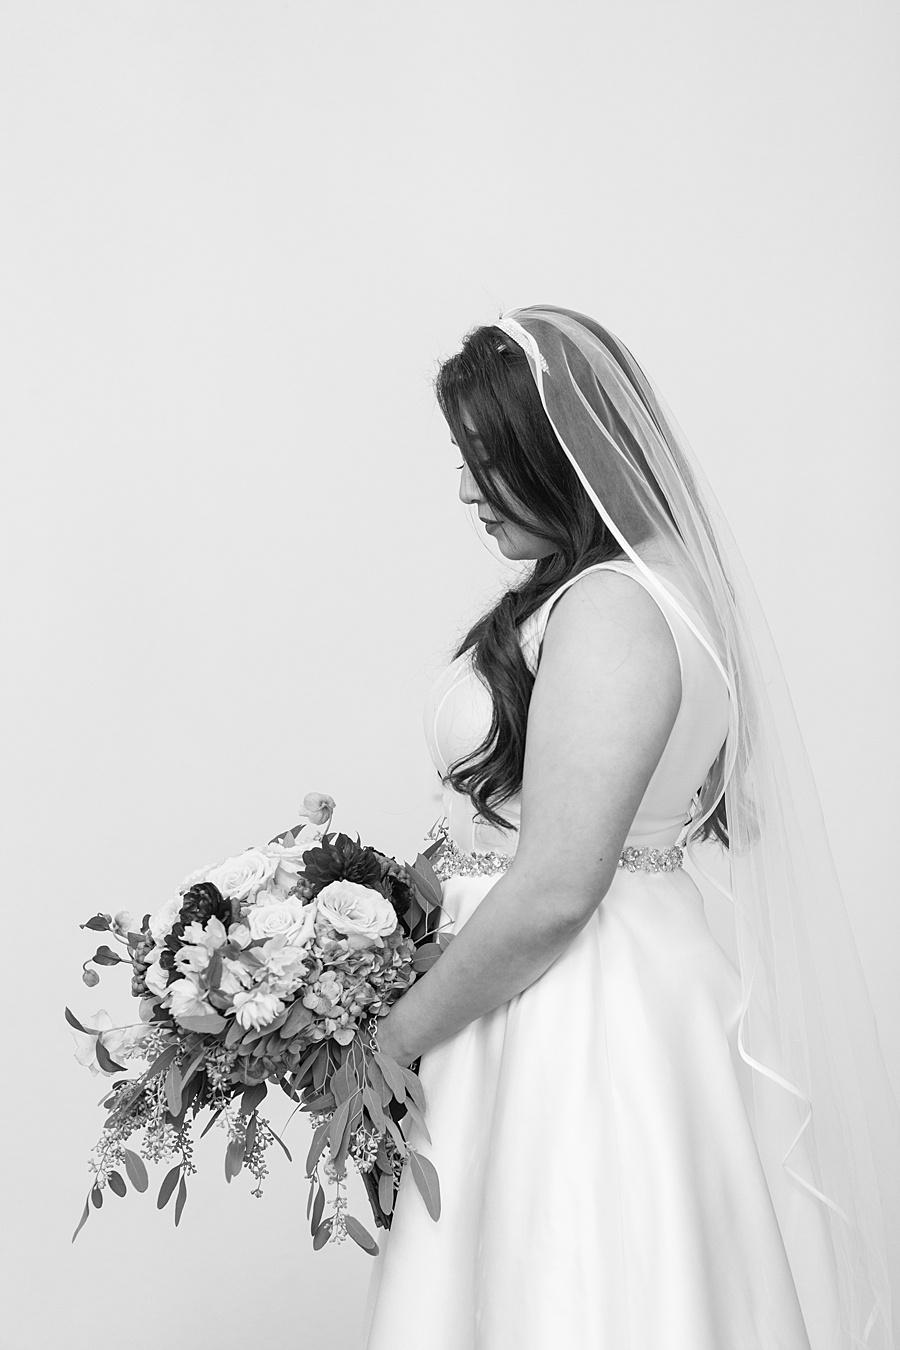 Stacy Anderson Photography Gates on Main Baytown Wedding Photographer_0002.jpg